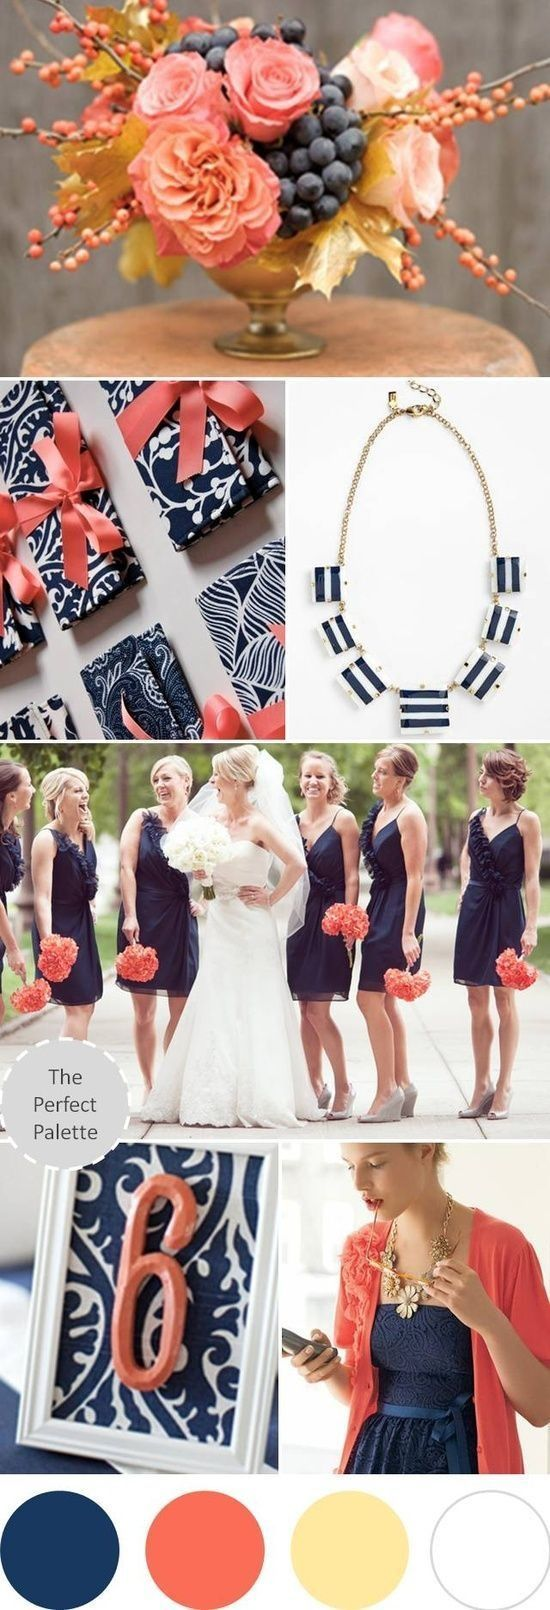 Pallet wedding decor ideas  Color ideas   Weddings  Pinterest  Wedding Weddings and